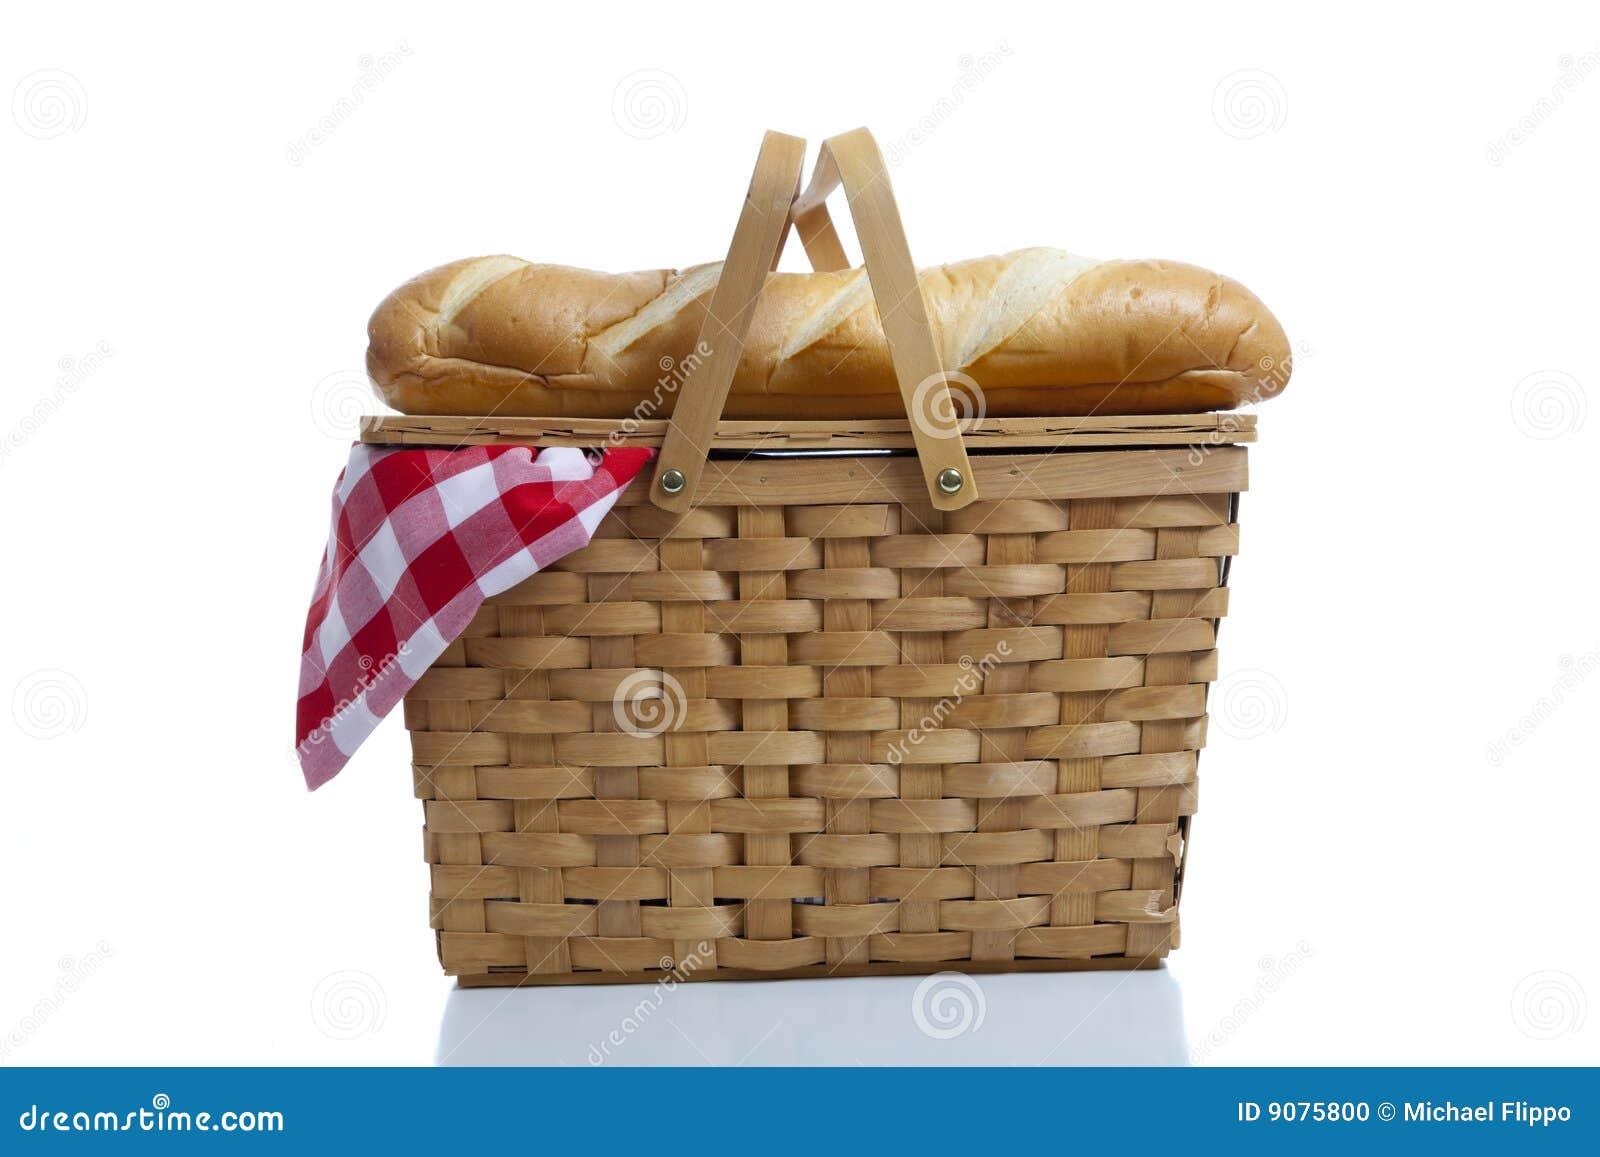 Picknick-Korb mit Gingham